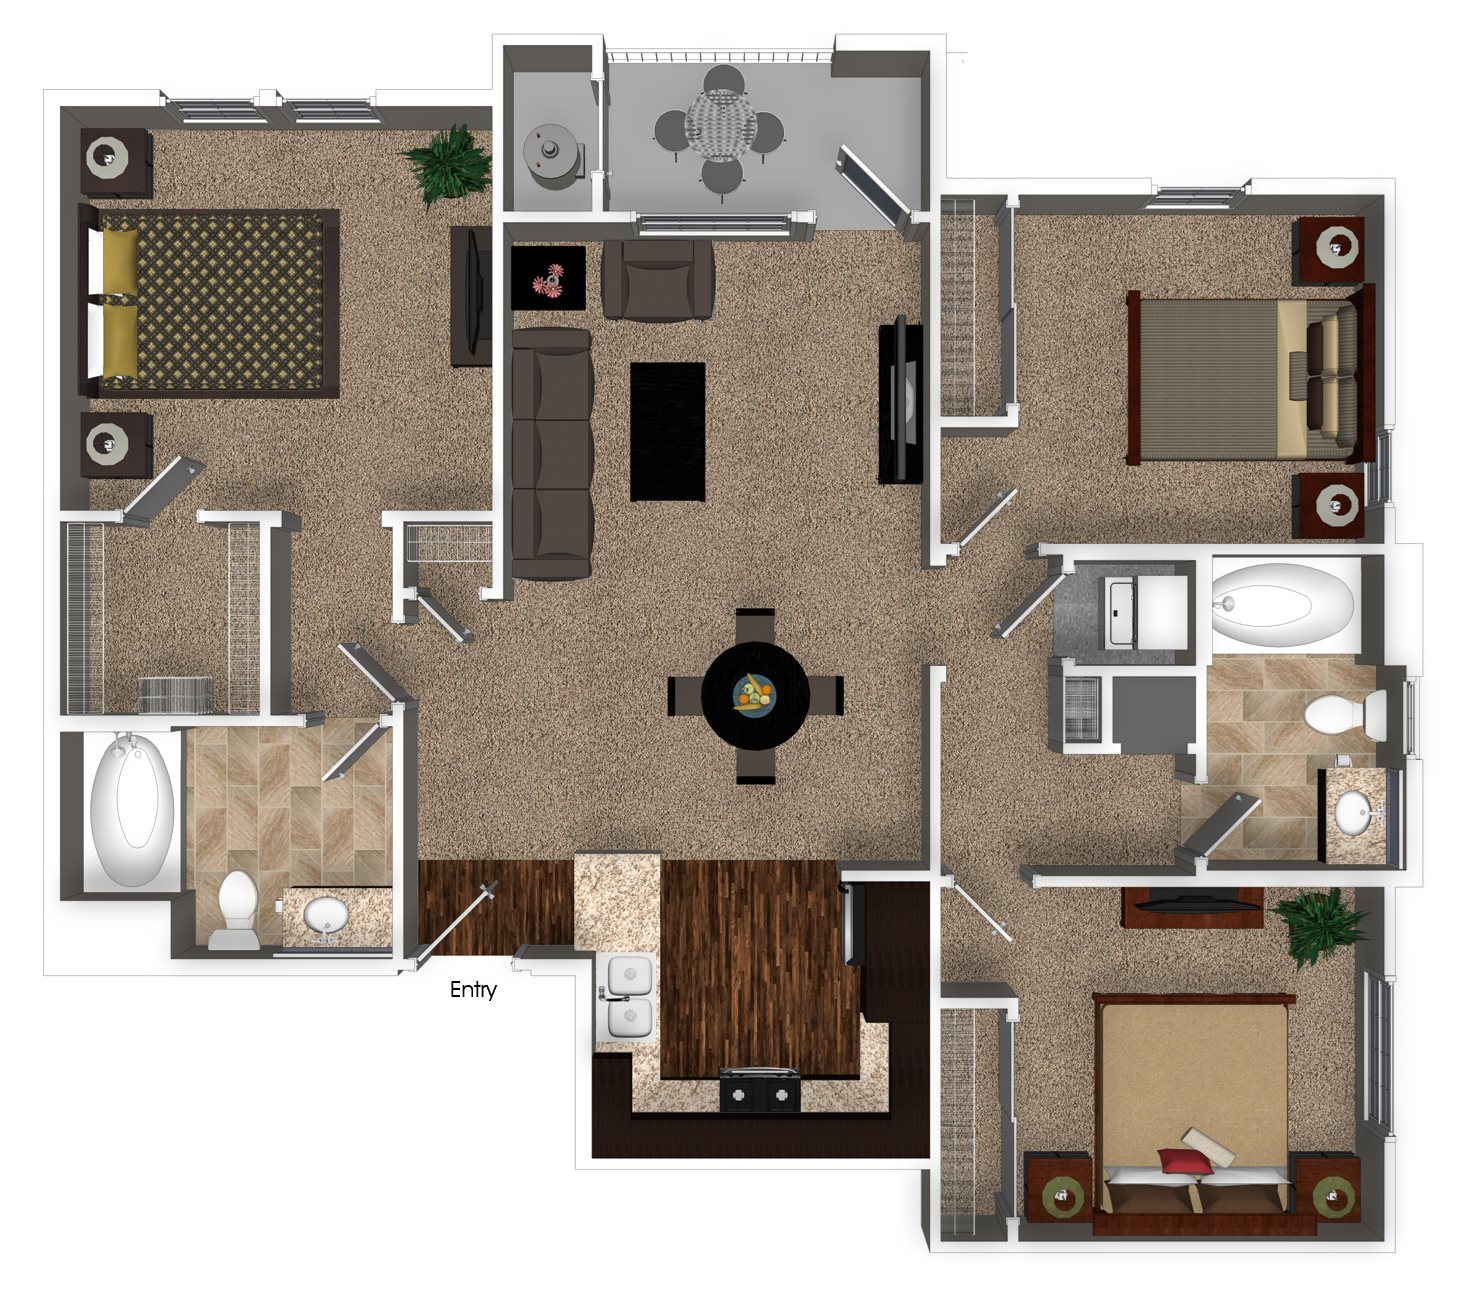 3 Bed 2 Bath 1188 sqft C1 Floorplan